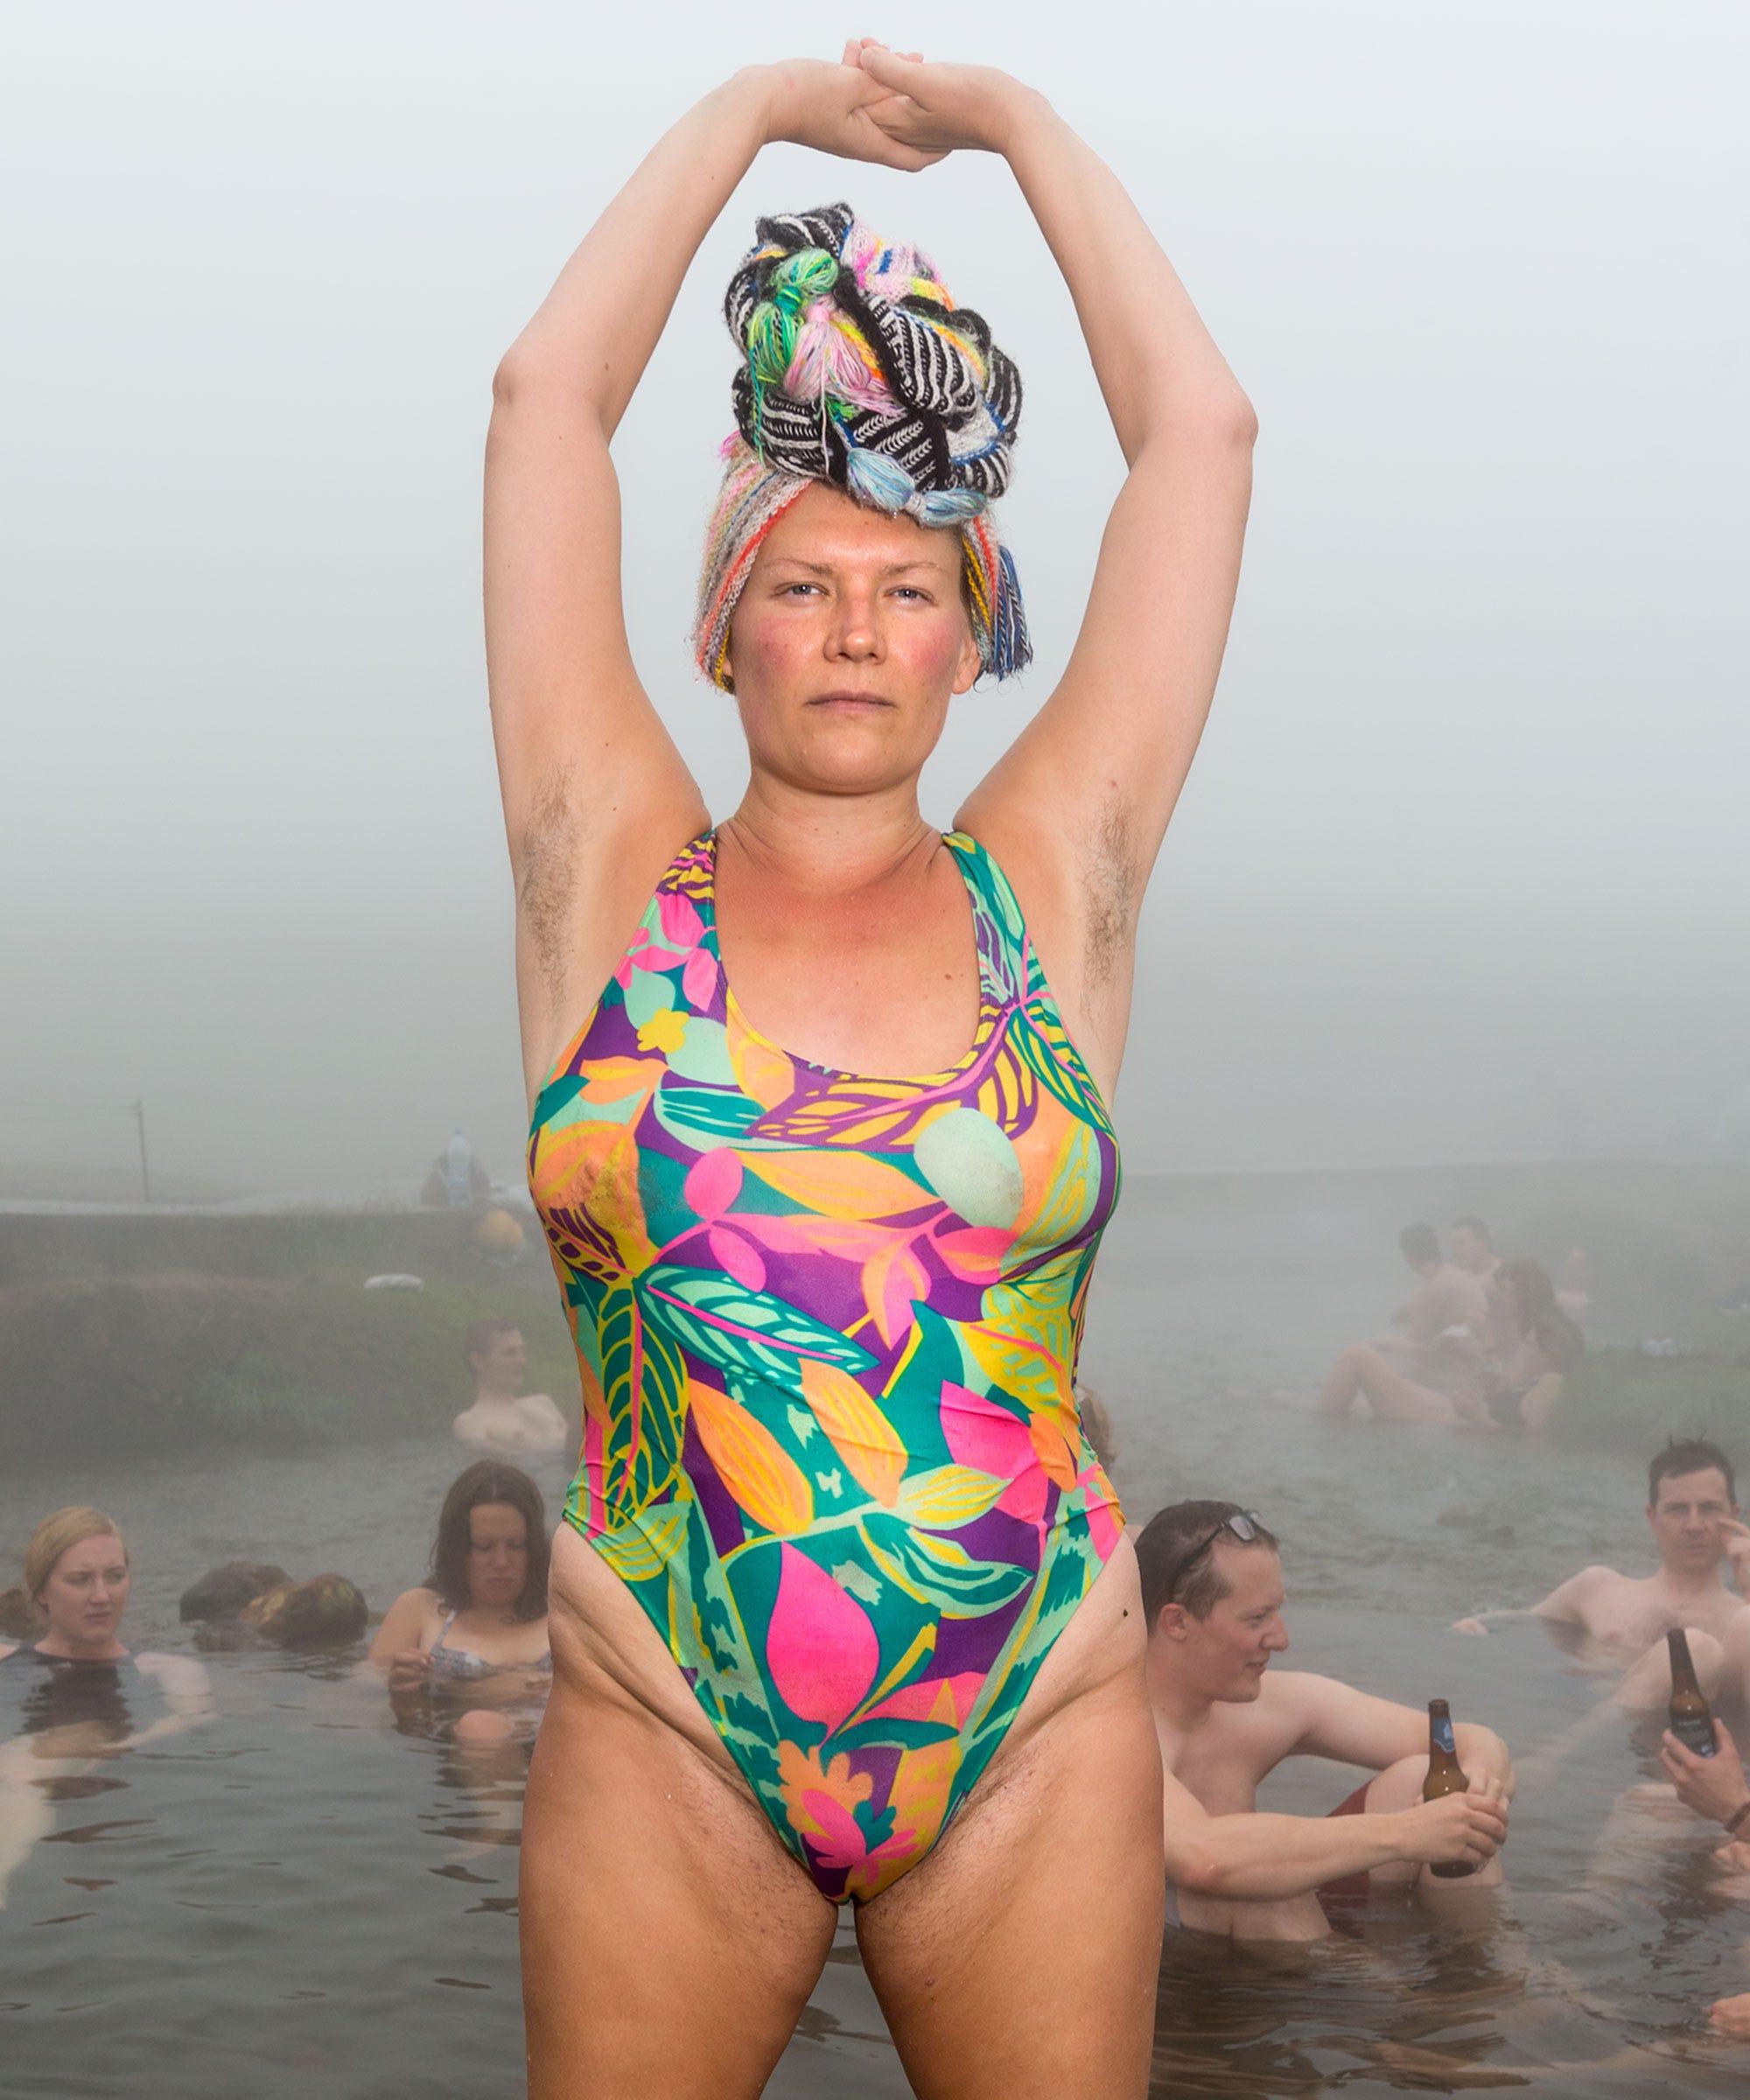 chubby-horny-mature-woman-best-bikini-contest-thong